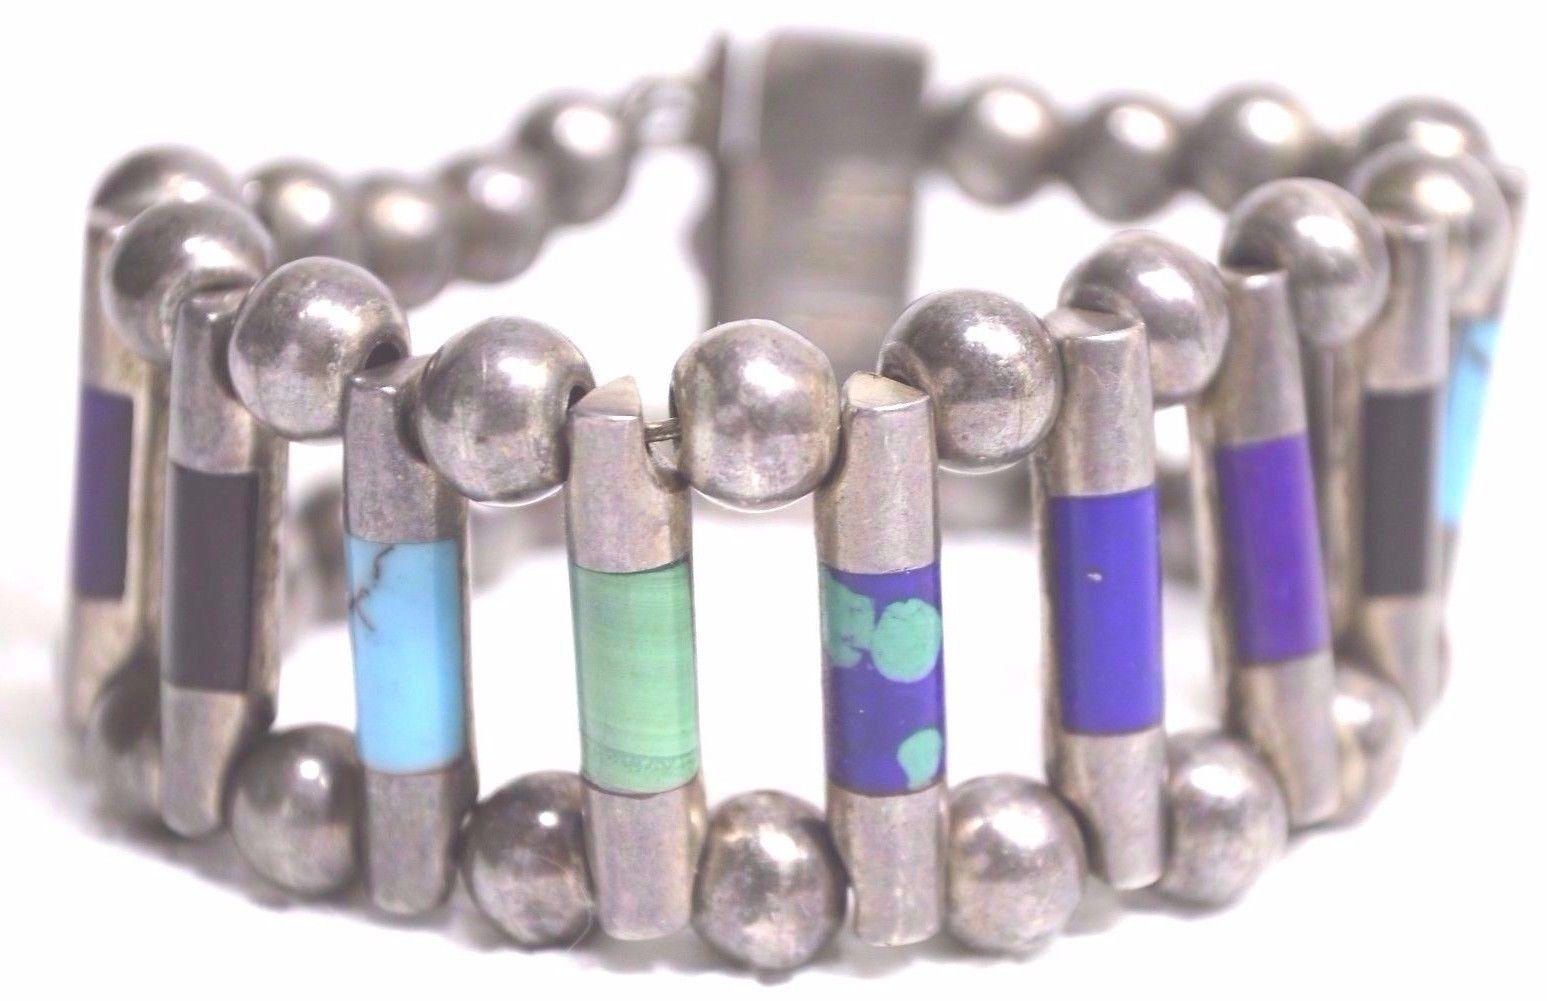 Bracelet .950 sterling turquoise lapis sugilite onyx malachite Mexico Taxco